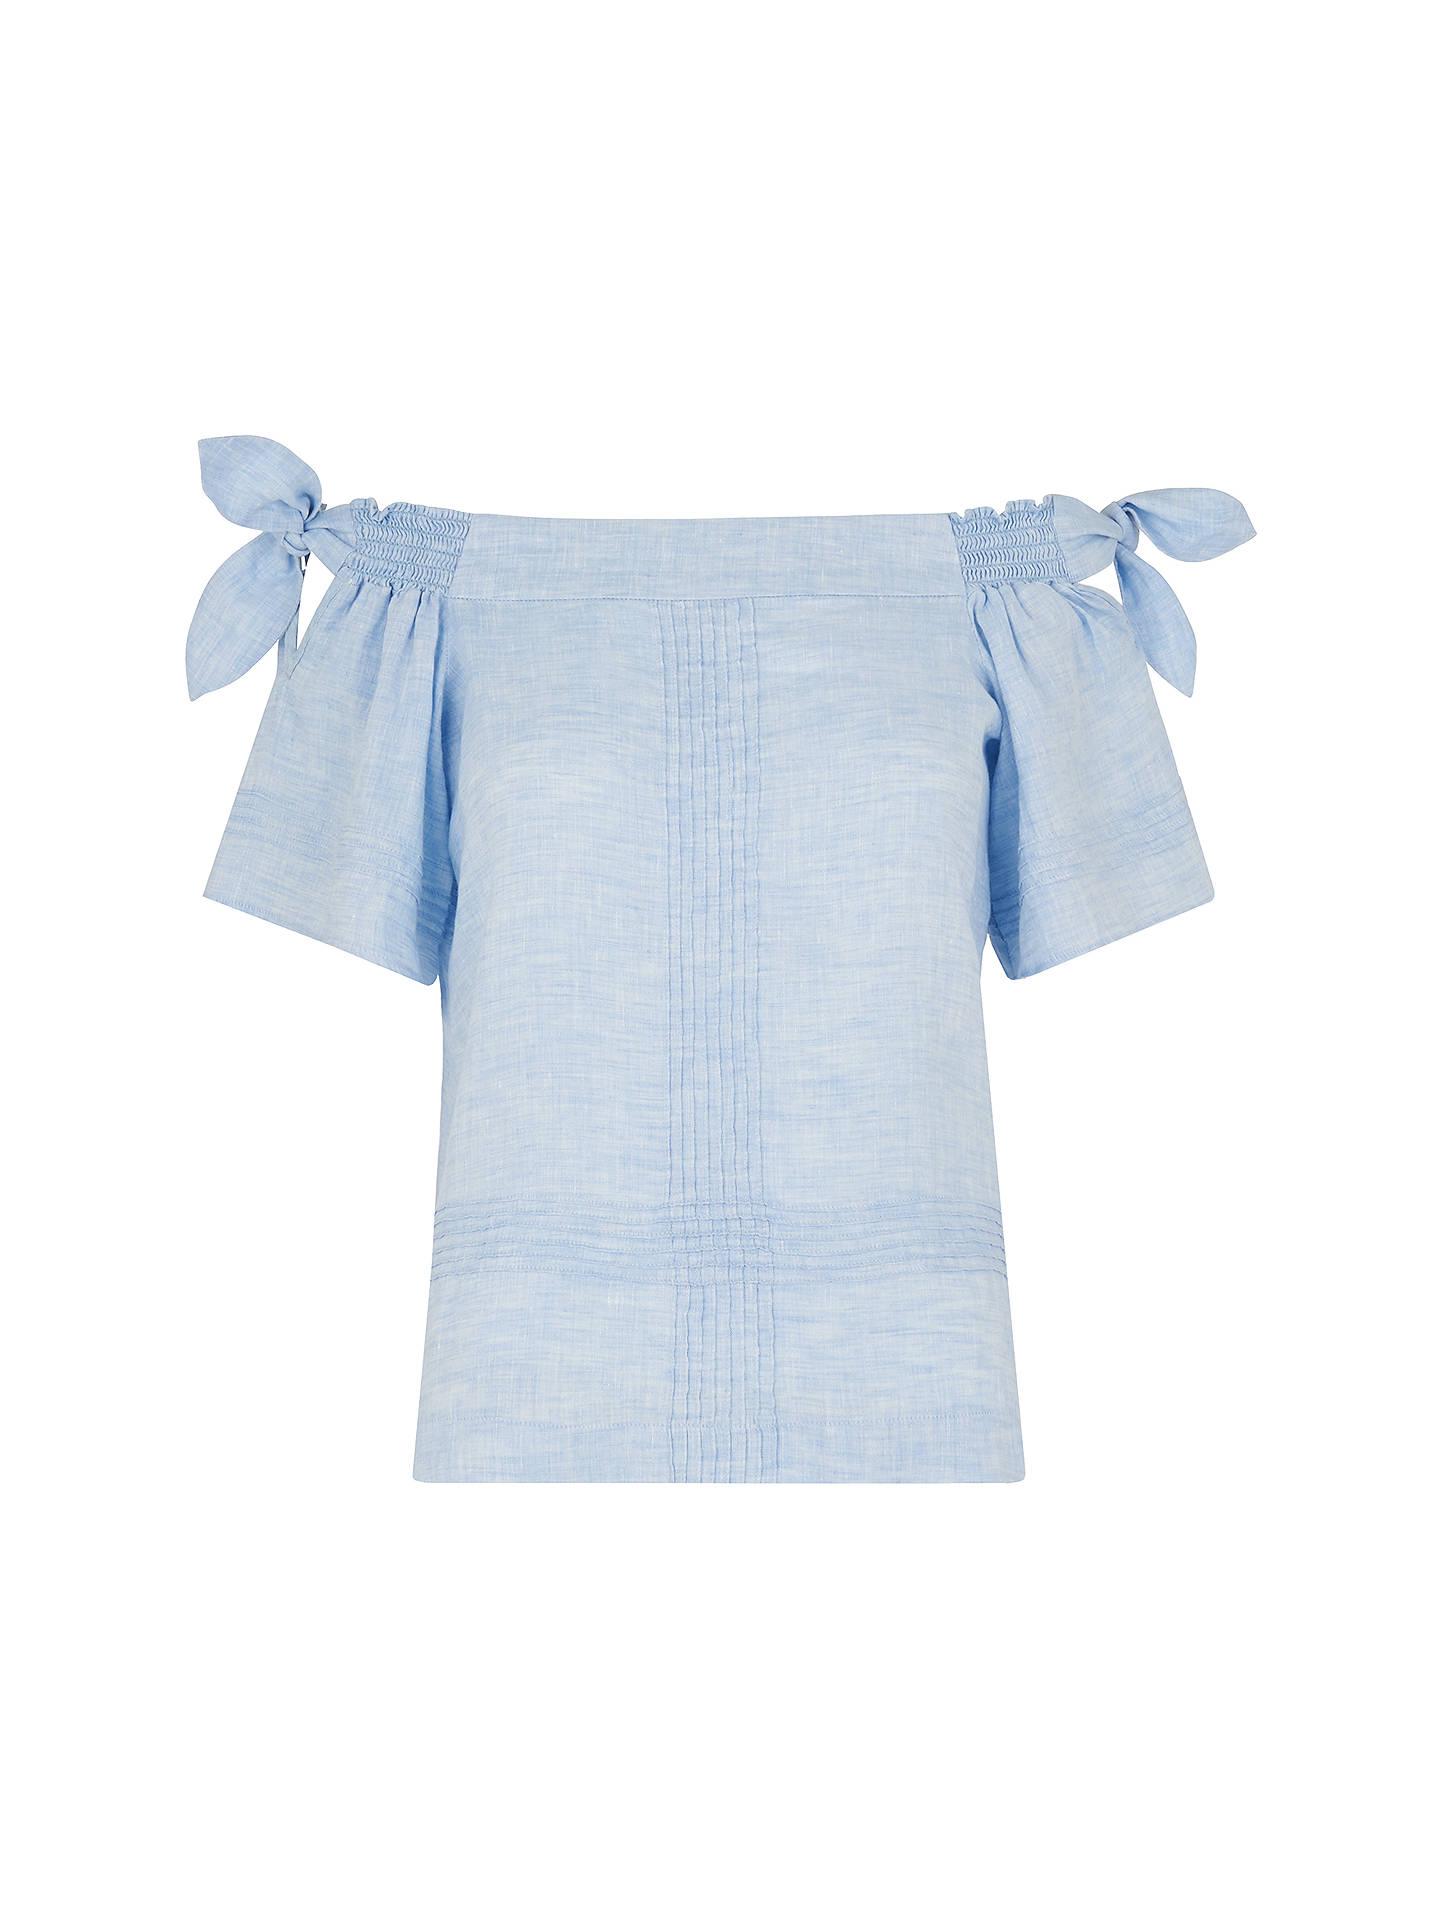 a3b85145fa038 Whistles Lila Tie Detail Linen Bardot Top at John Lewis   Partners